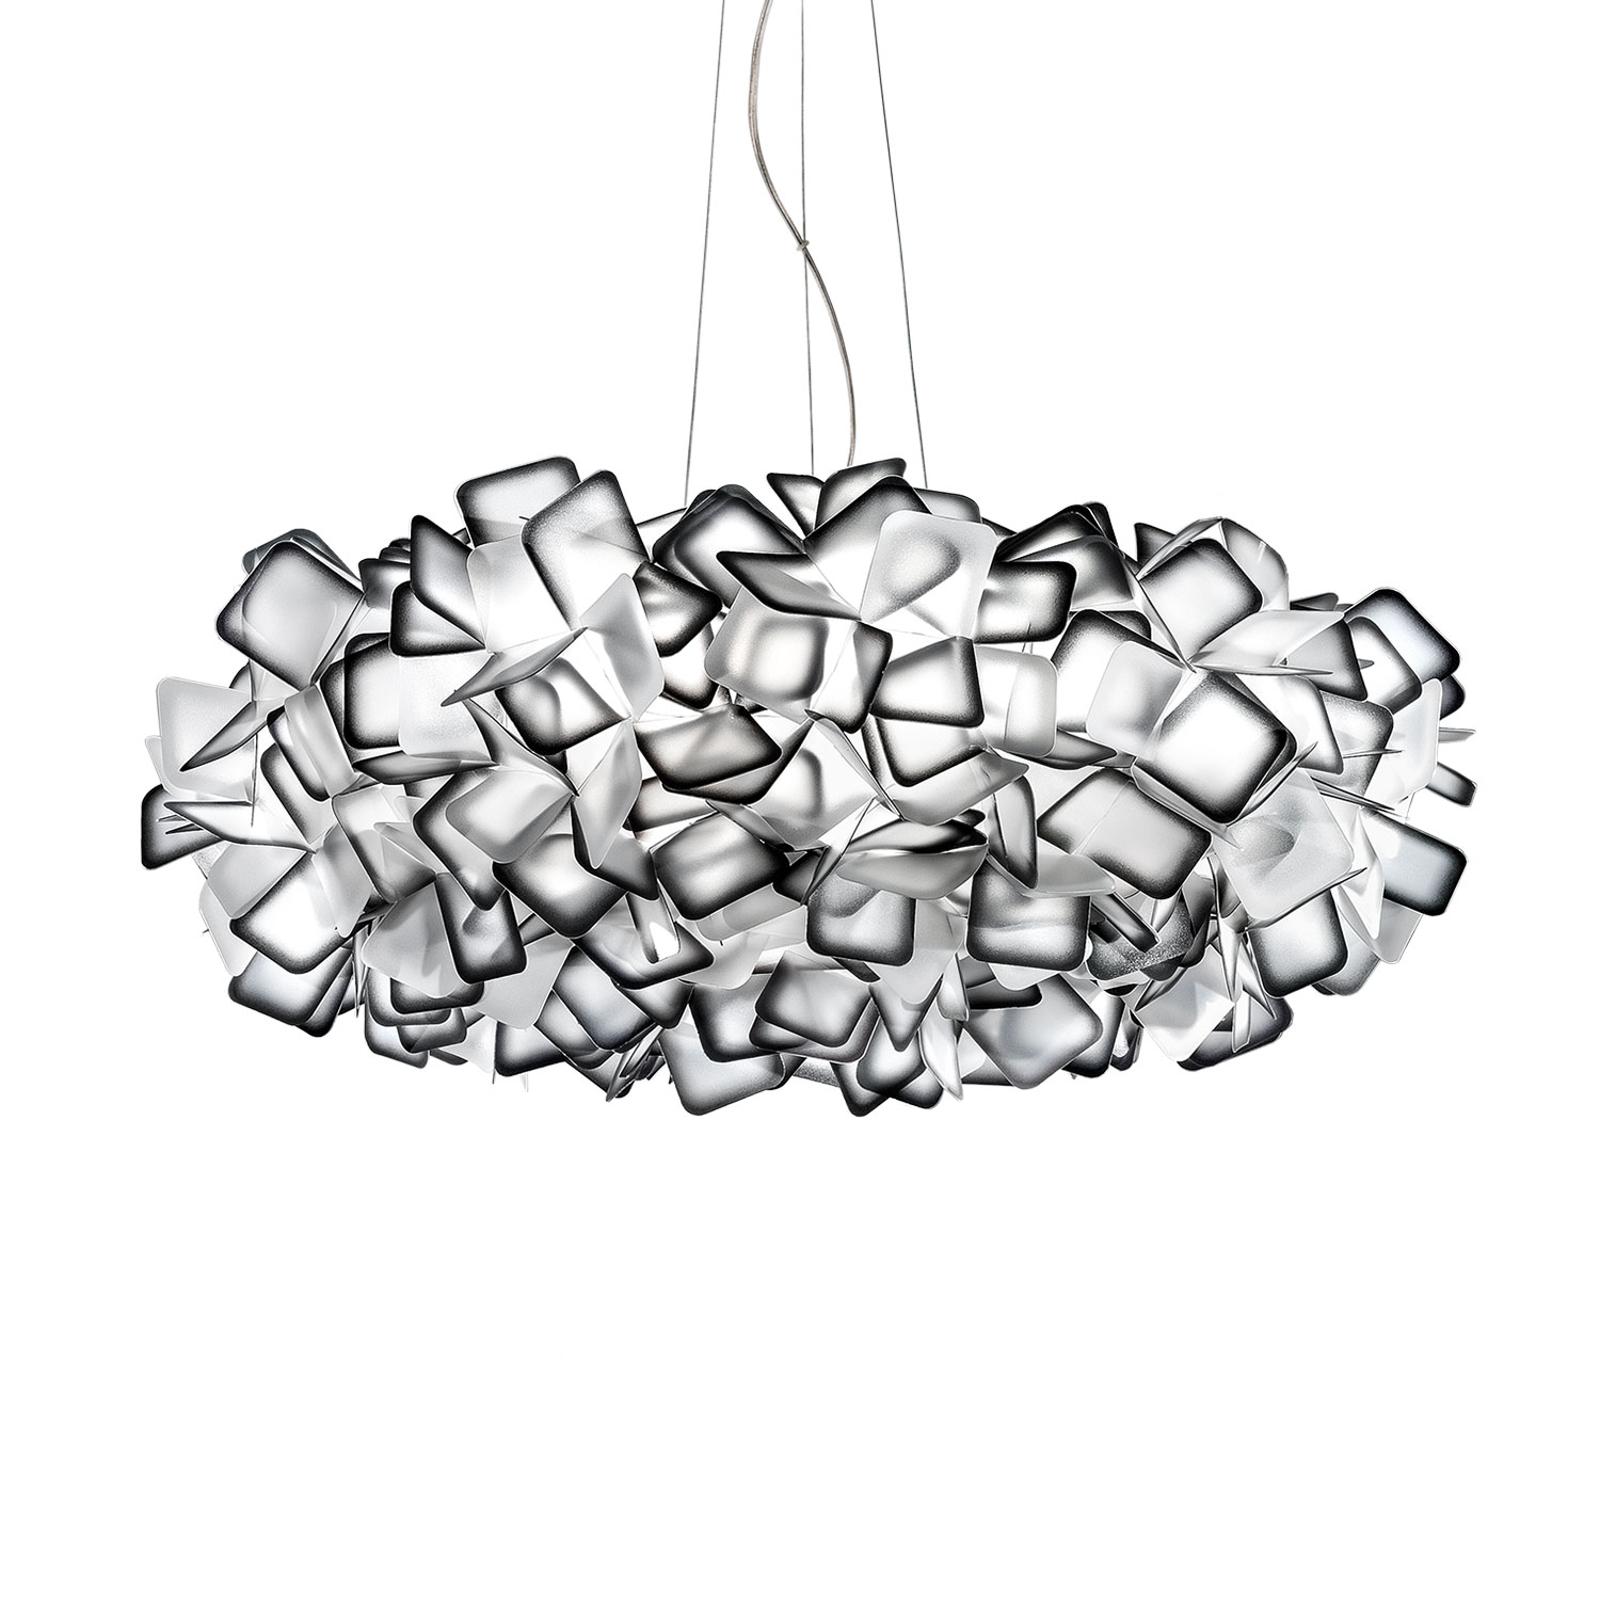 Slamp Clizia hanglamp, Ø 78 cm, zwart